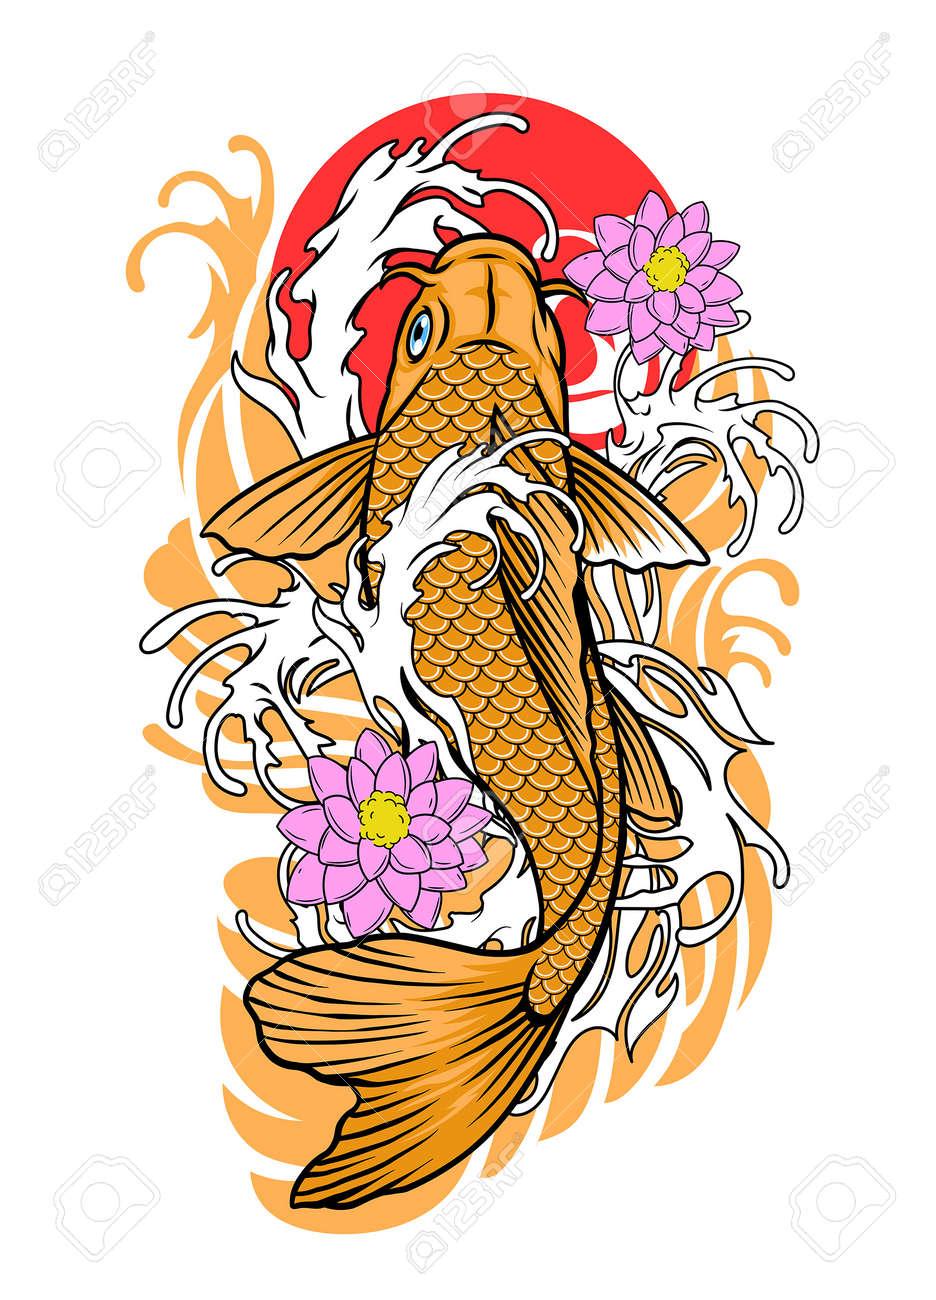 vector of koi fish tattoo design in vintage look - 163540991